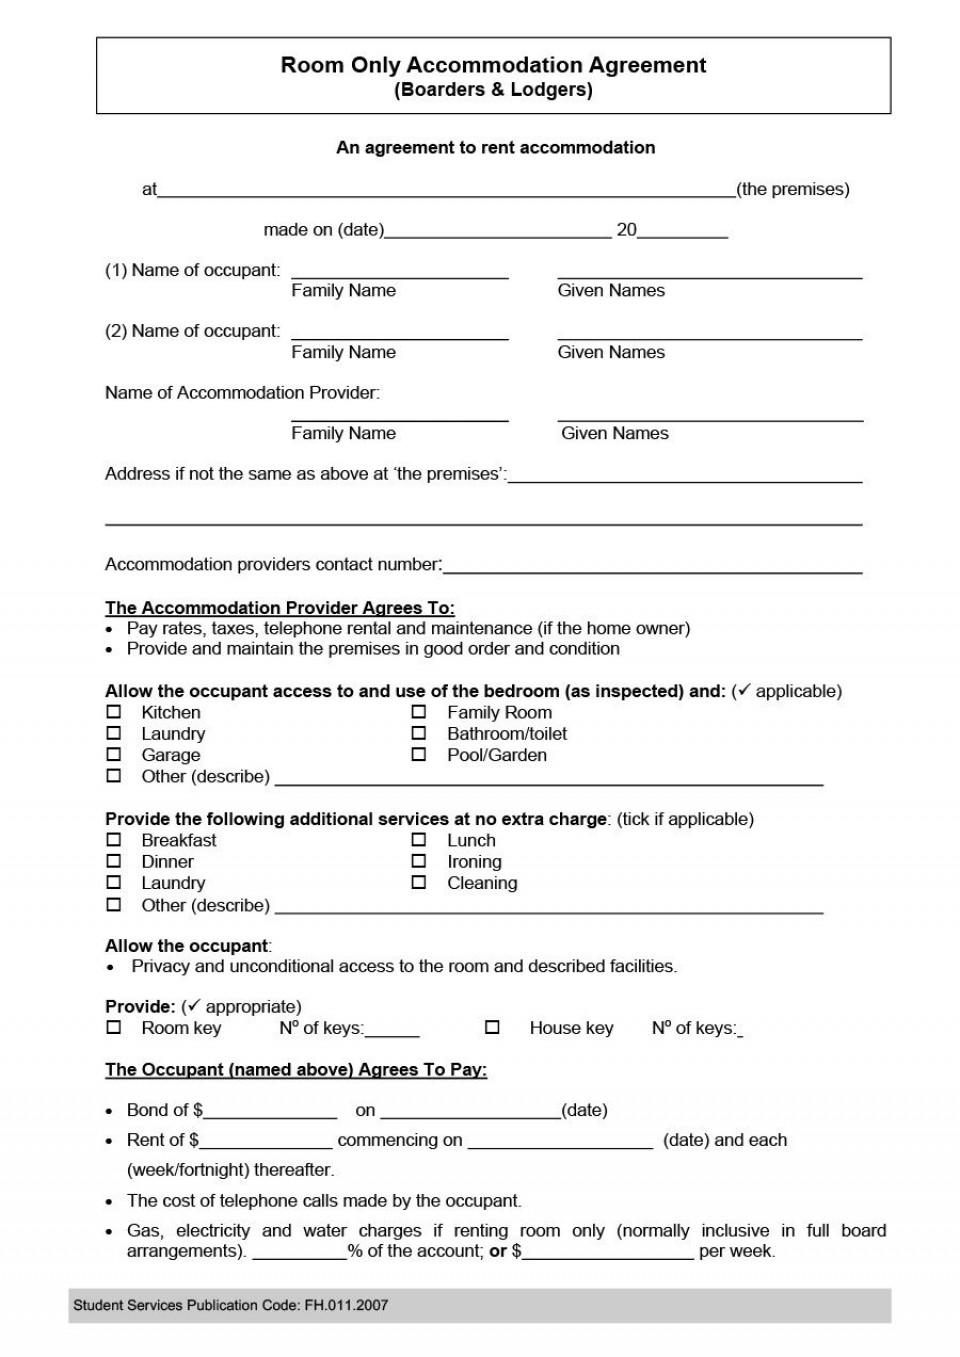 005 Incredible Generic Room Rental Agreement Free Idea  Printable960